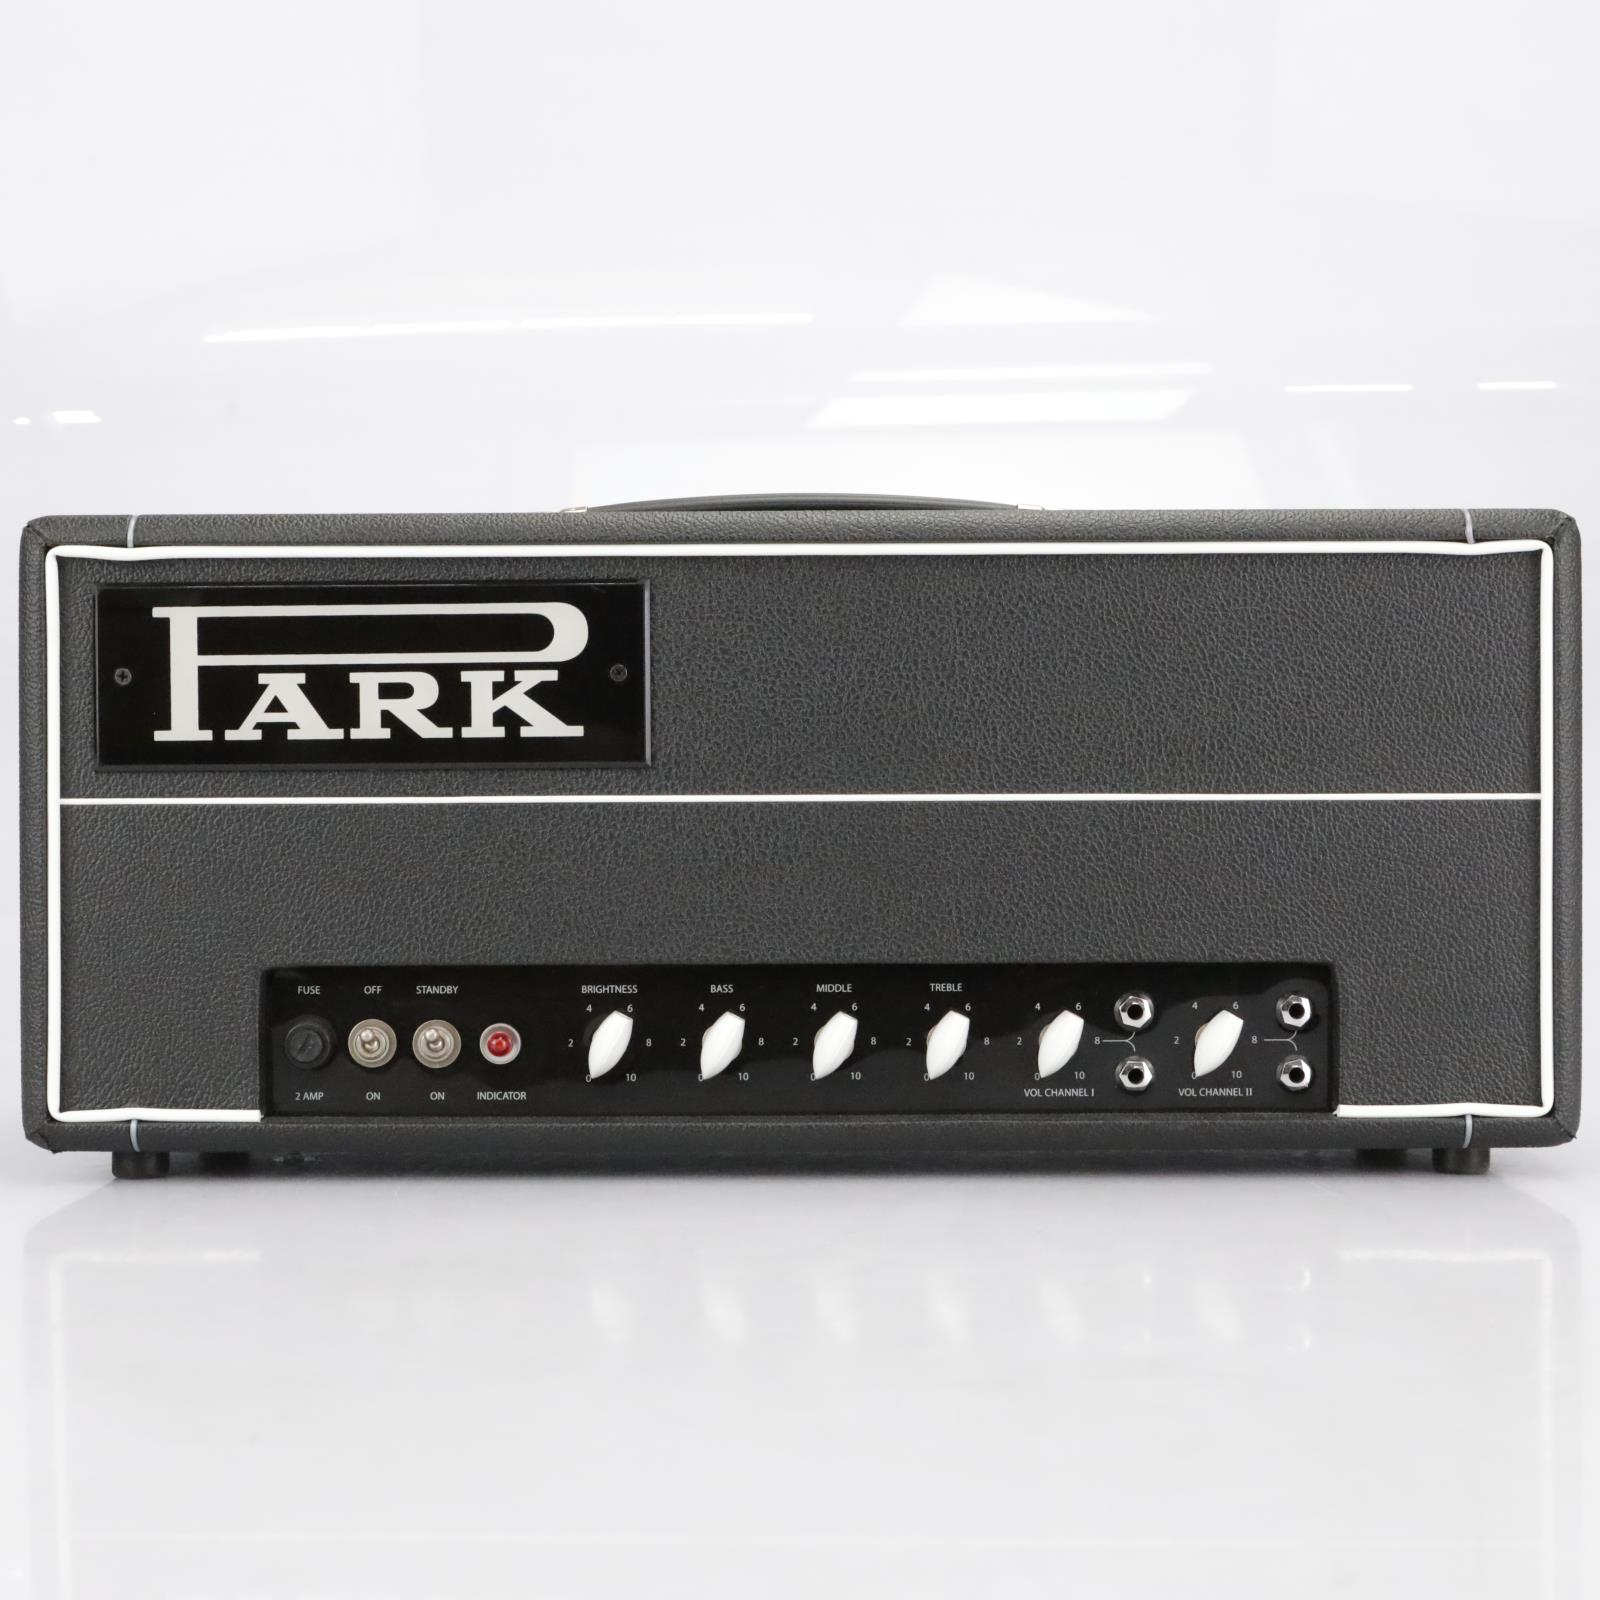 Park LTD 75 Limited Edition 75 Amplifier Amp Head #41192